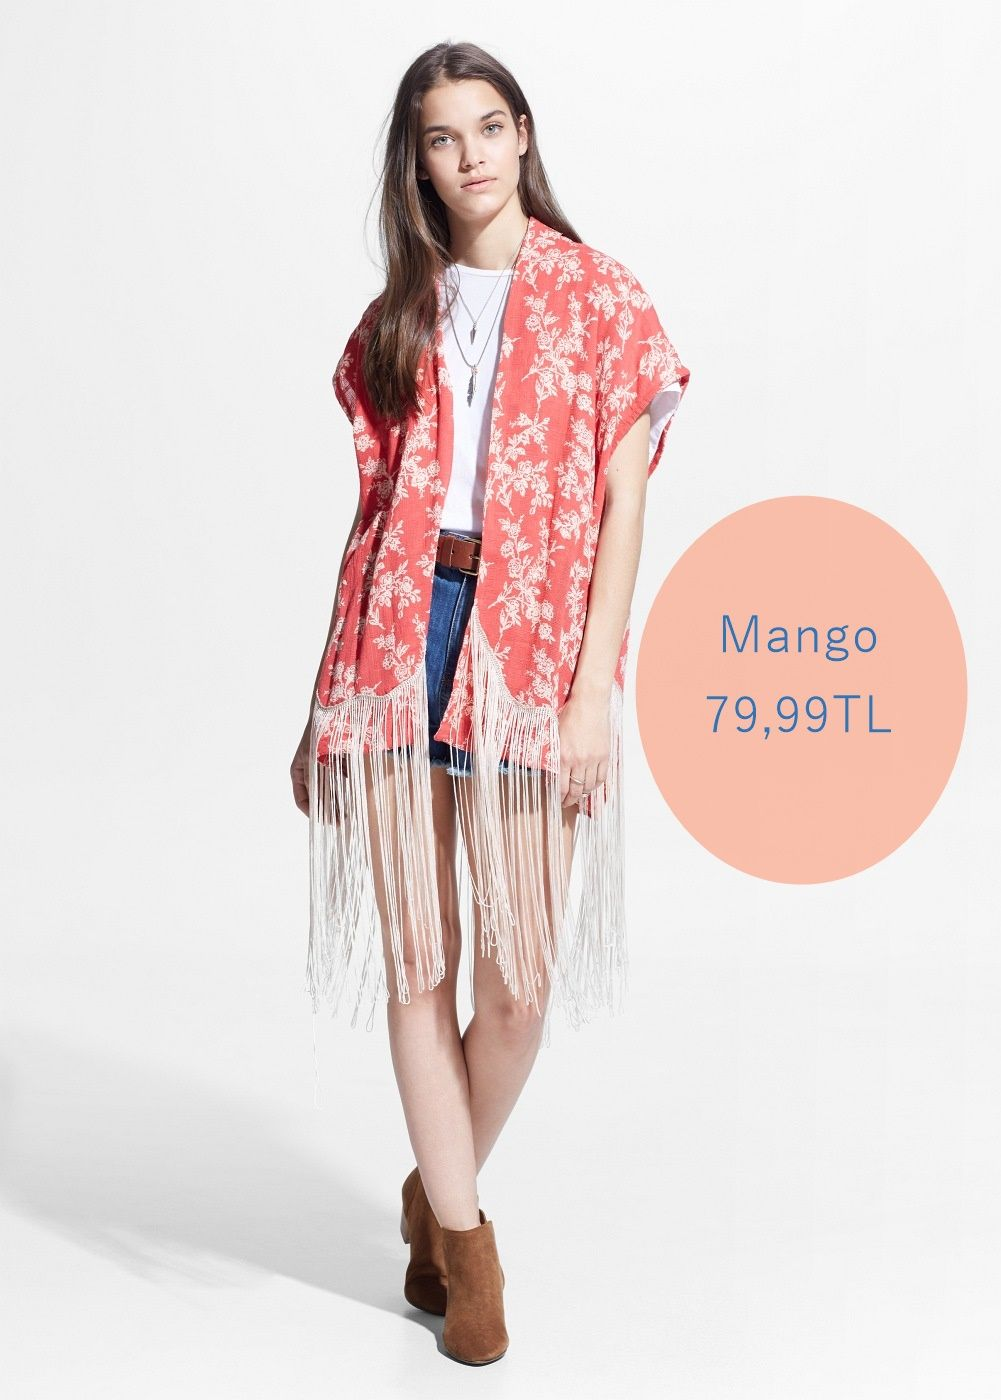 2015 Yaz Trendi: Kimonolar Nasıl Kombinlenir? #kimono #summer #fashion #mango